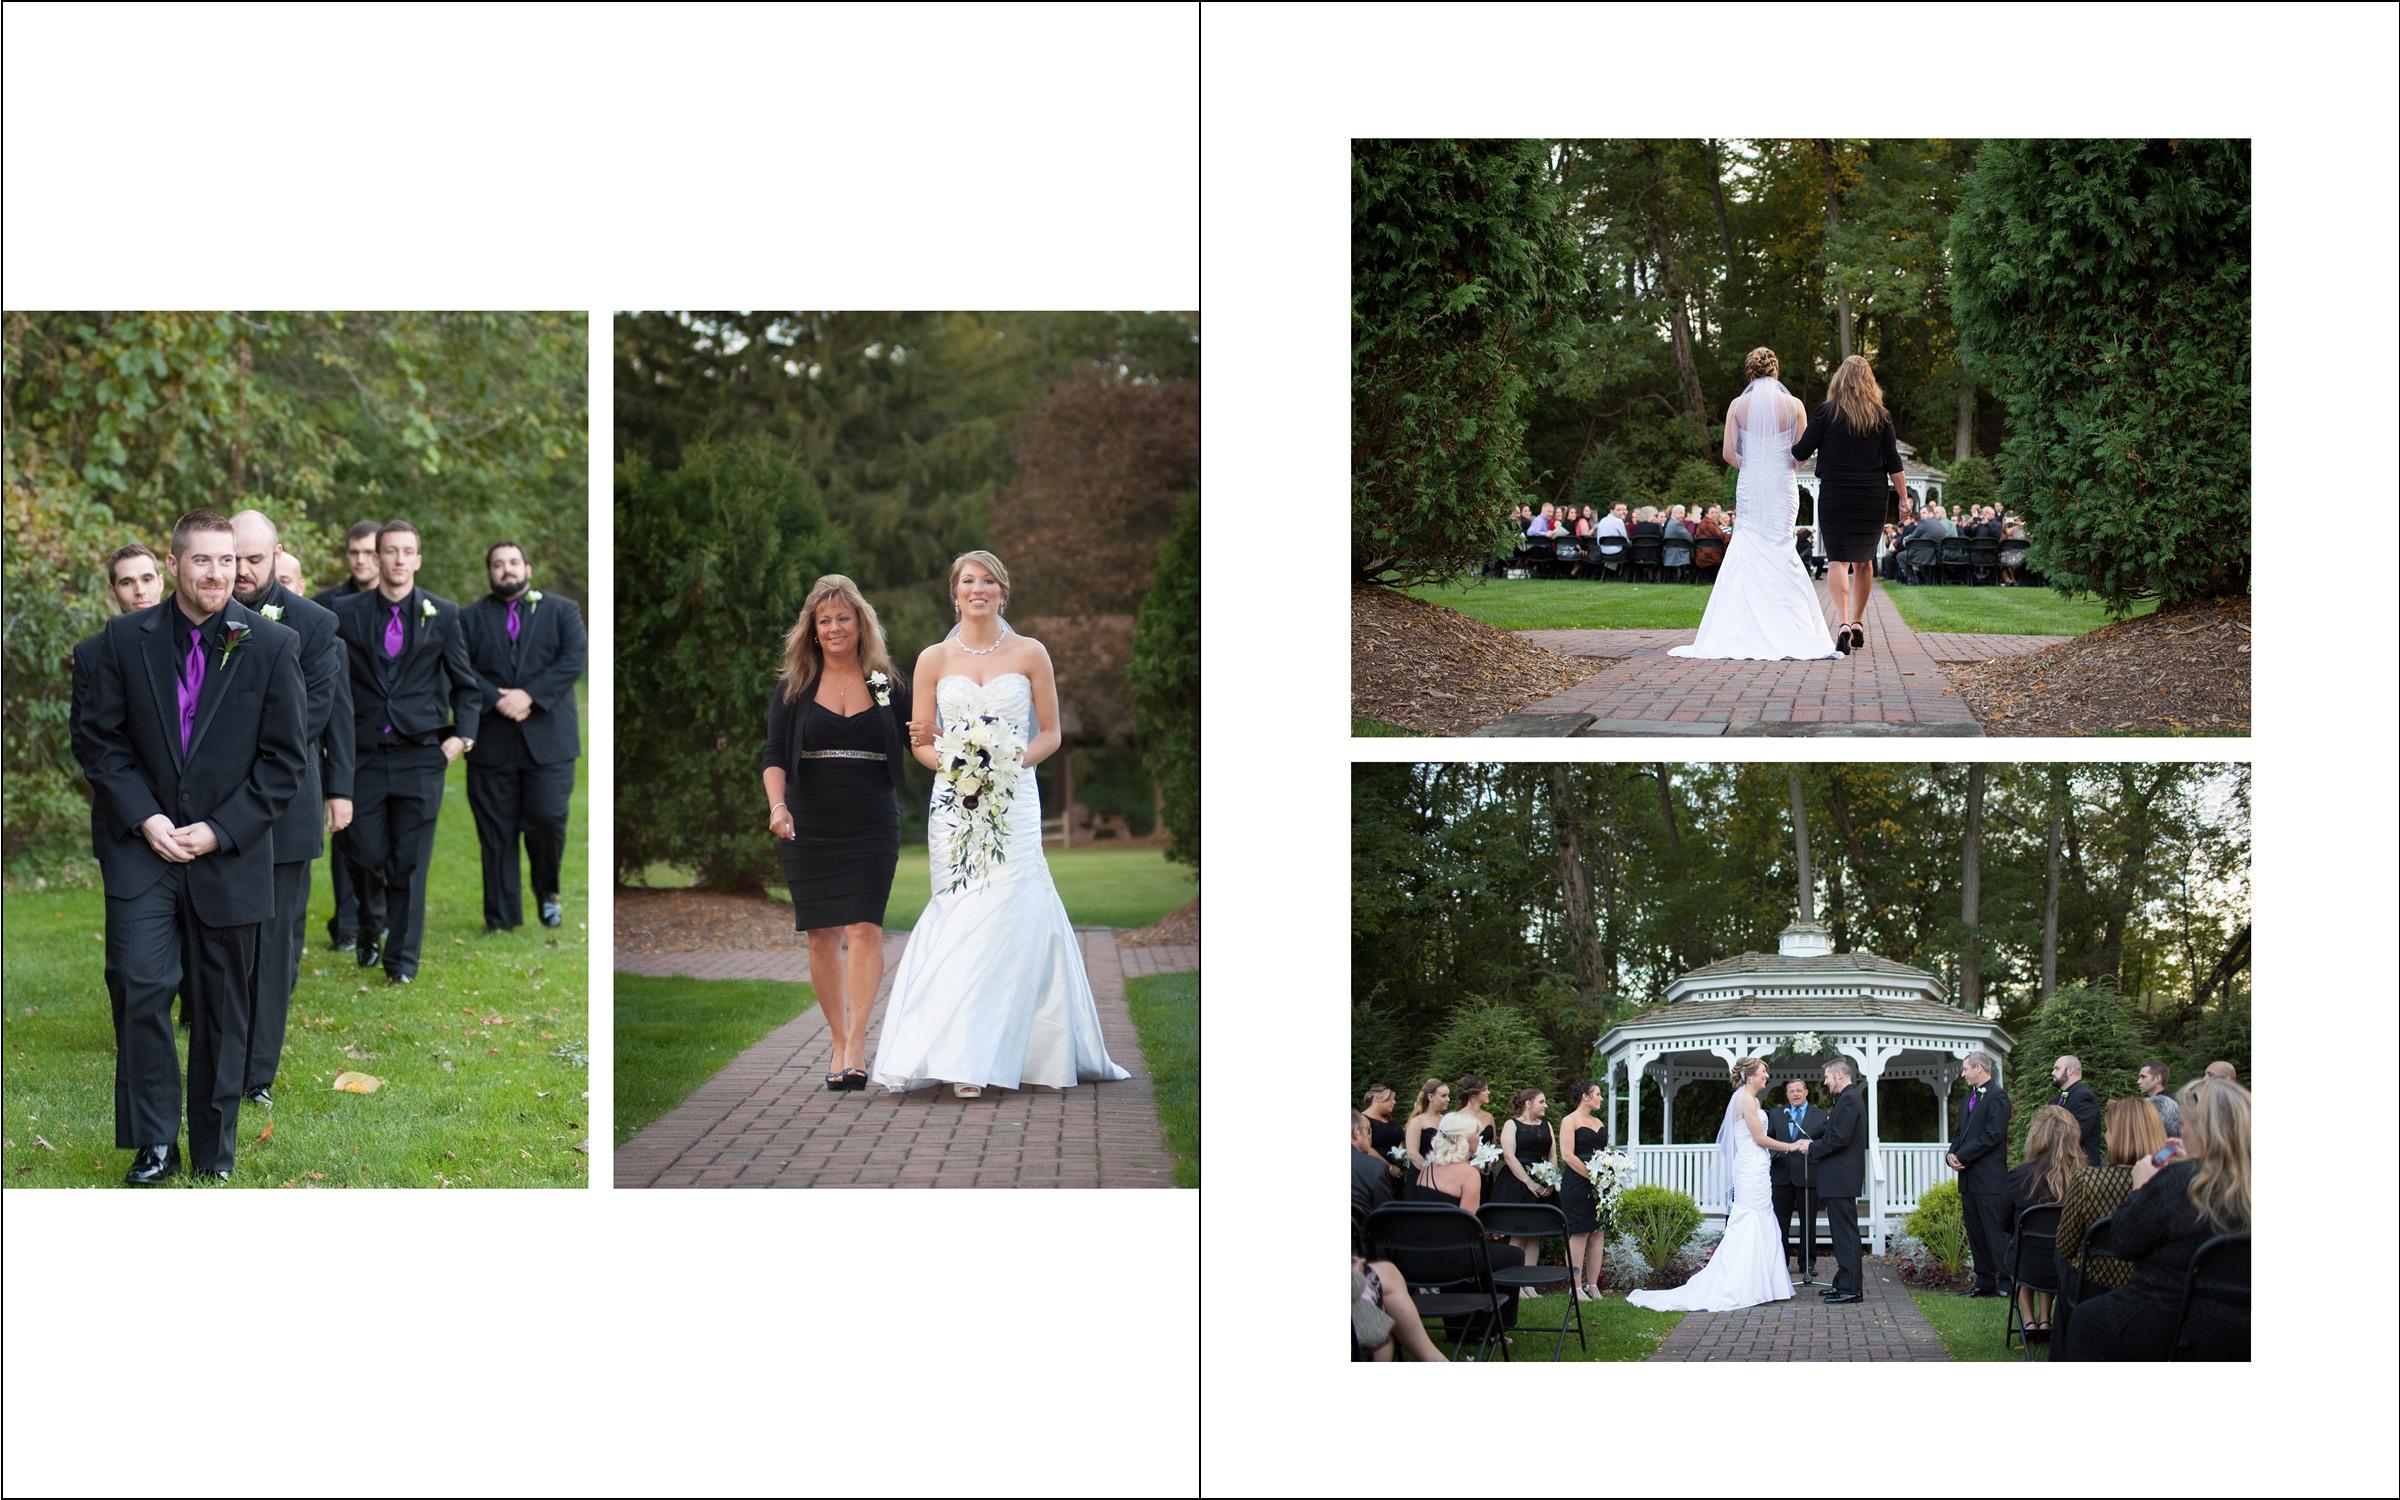 8x10 Wedding Album5.jpg